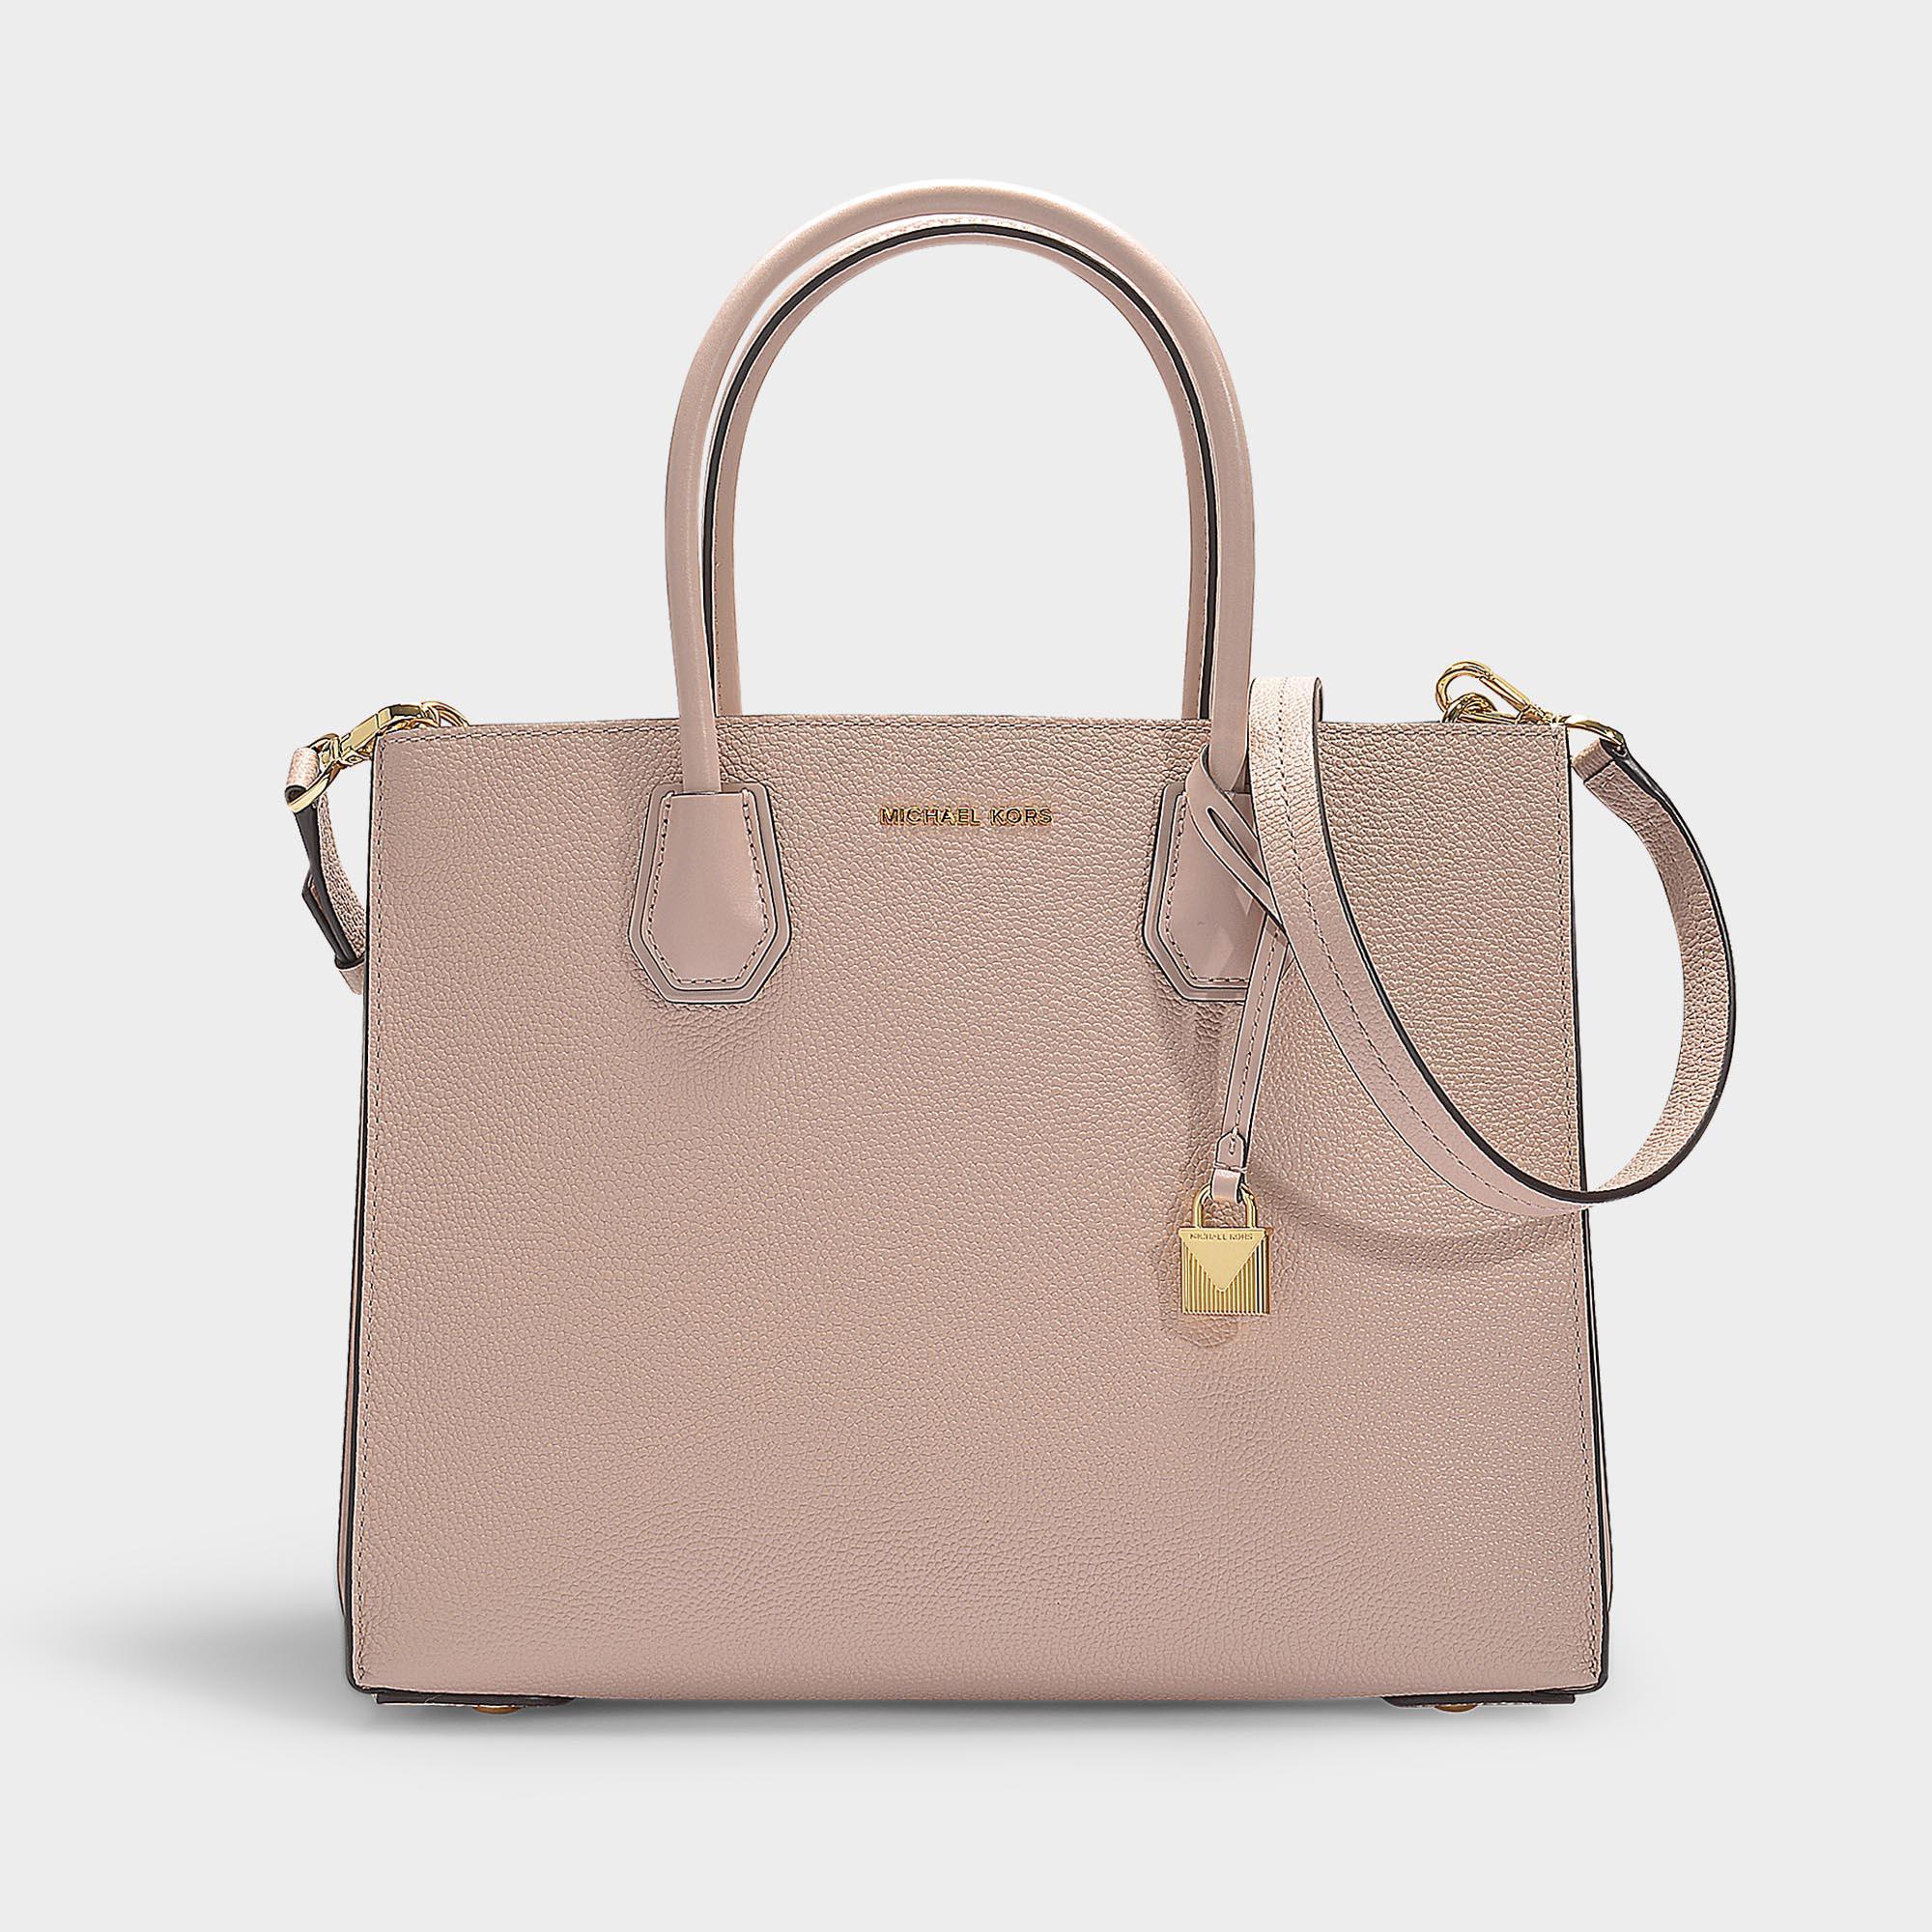 0d79e47e3b91 MICHAEL Michael Kors. Women s Mercer Large Accordion Convertible Tote Bag  In Soft Pink Grained Calfskin